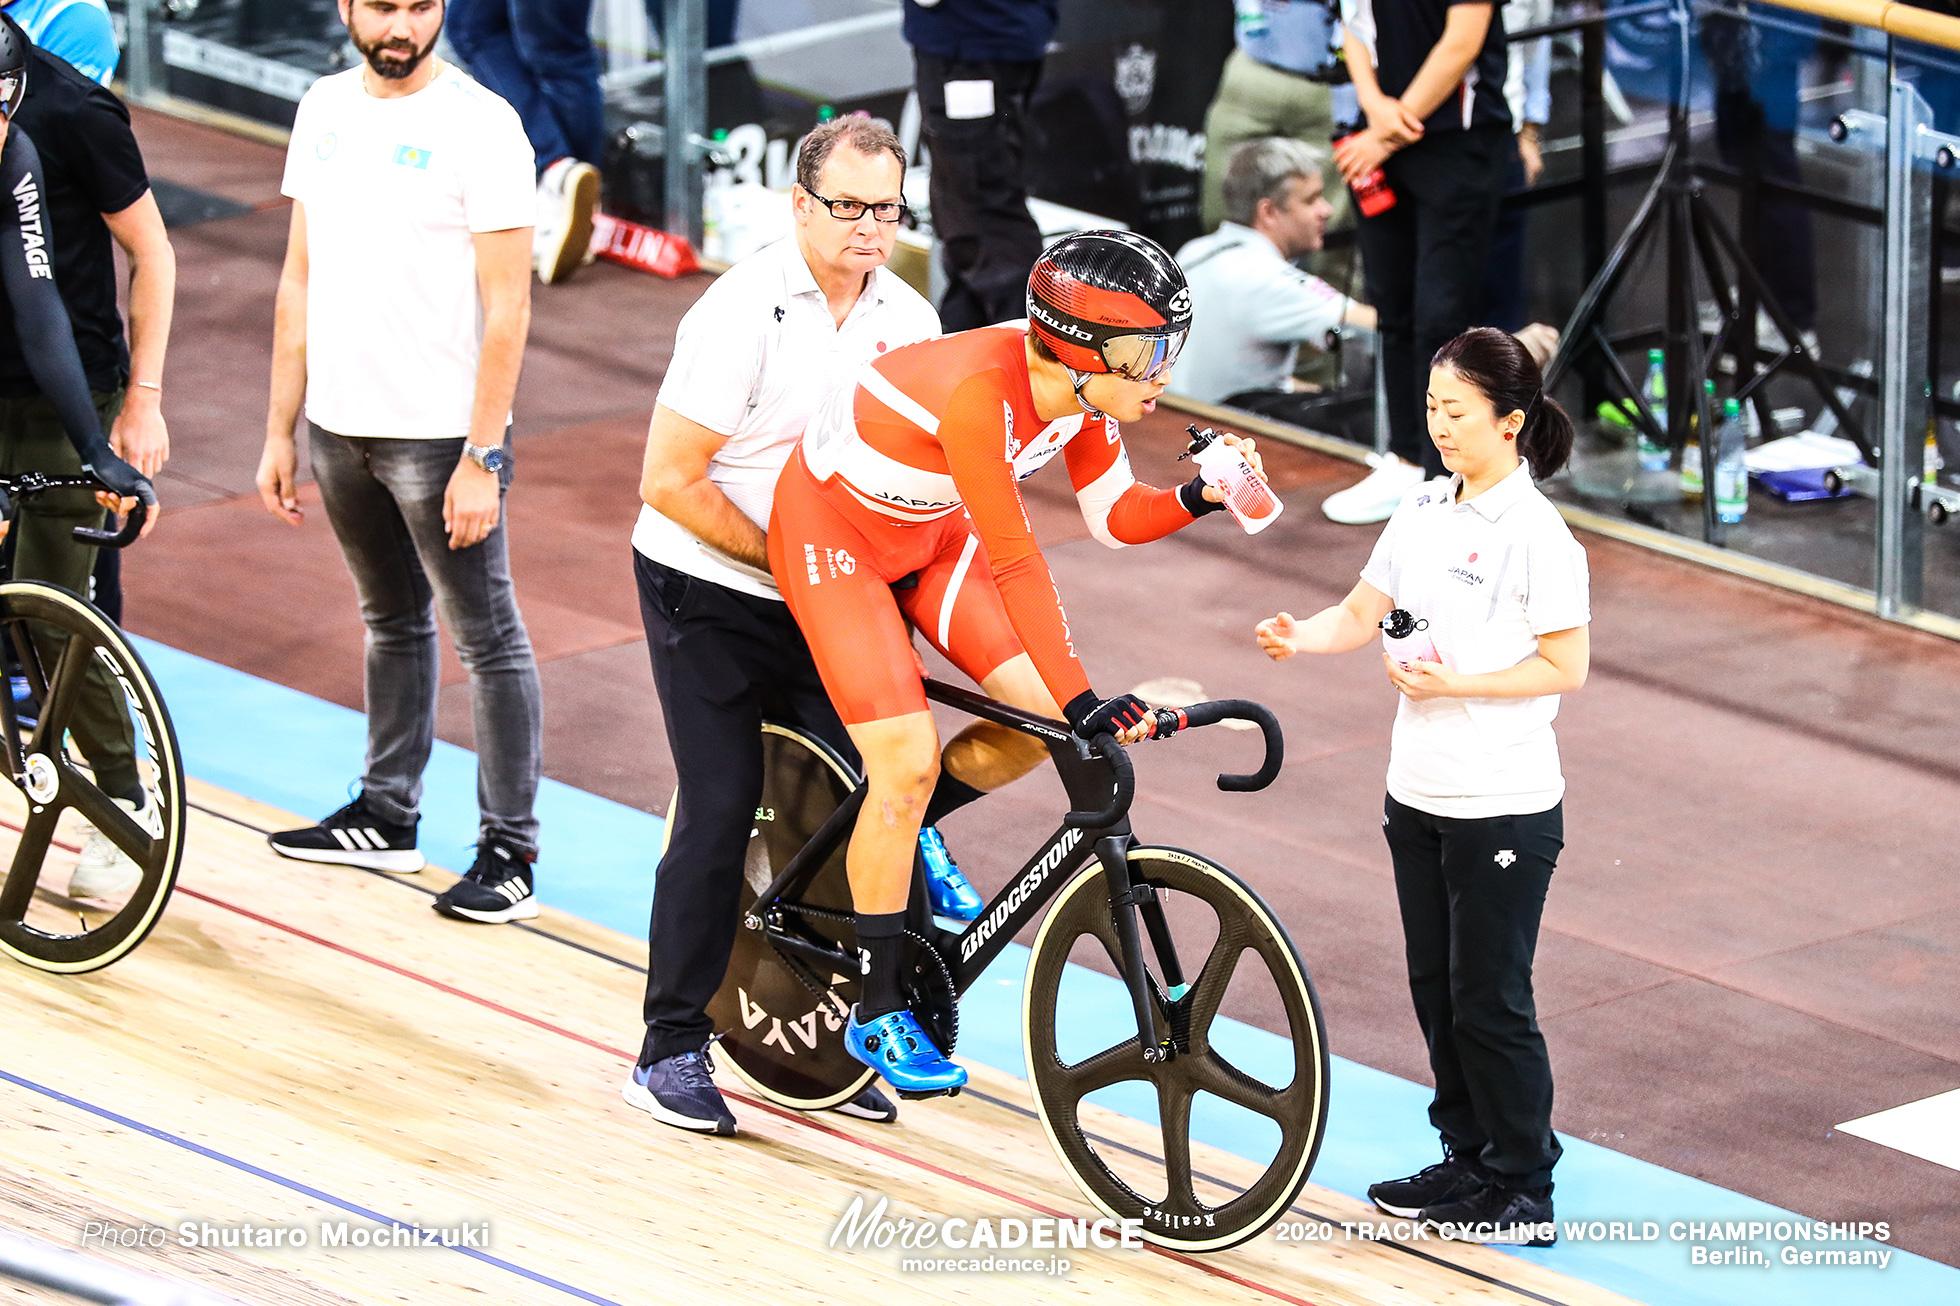 Scratch Race / Men's Omnium / 2020 Track Cycling World Championships